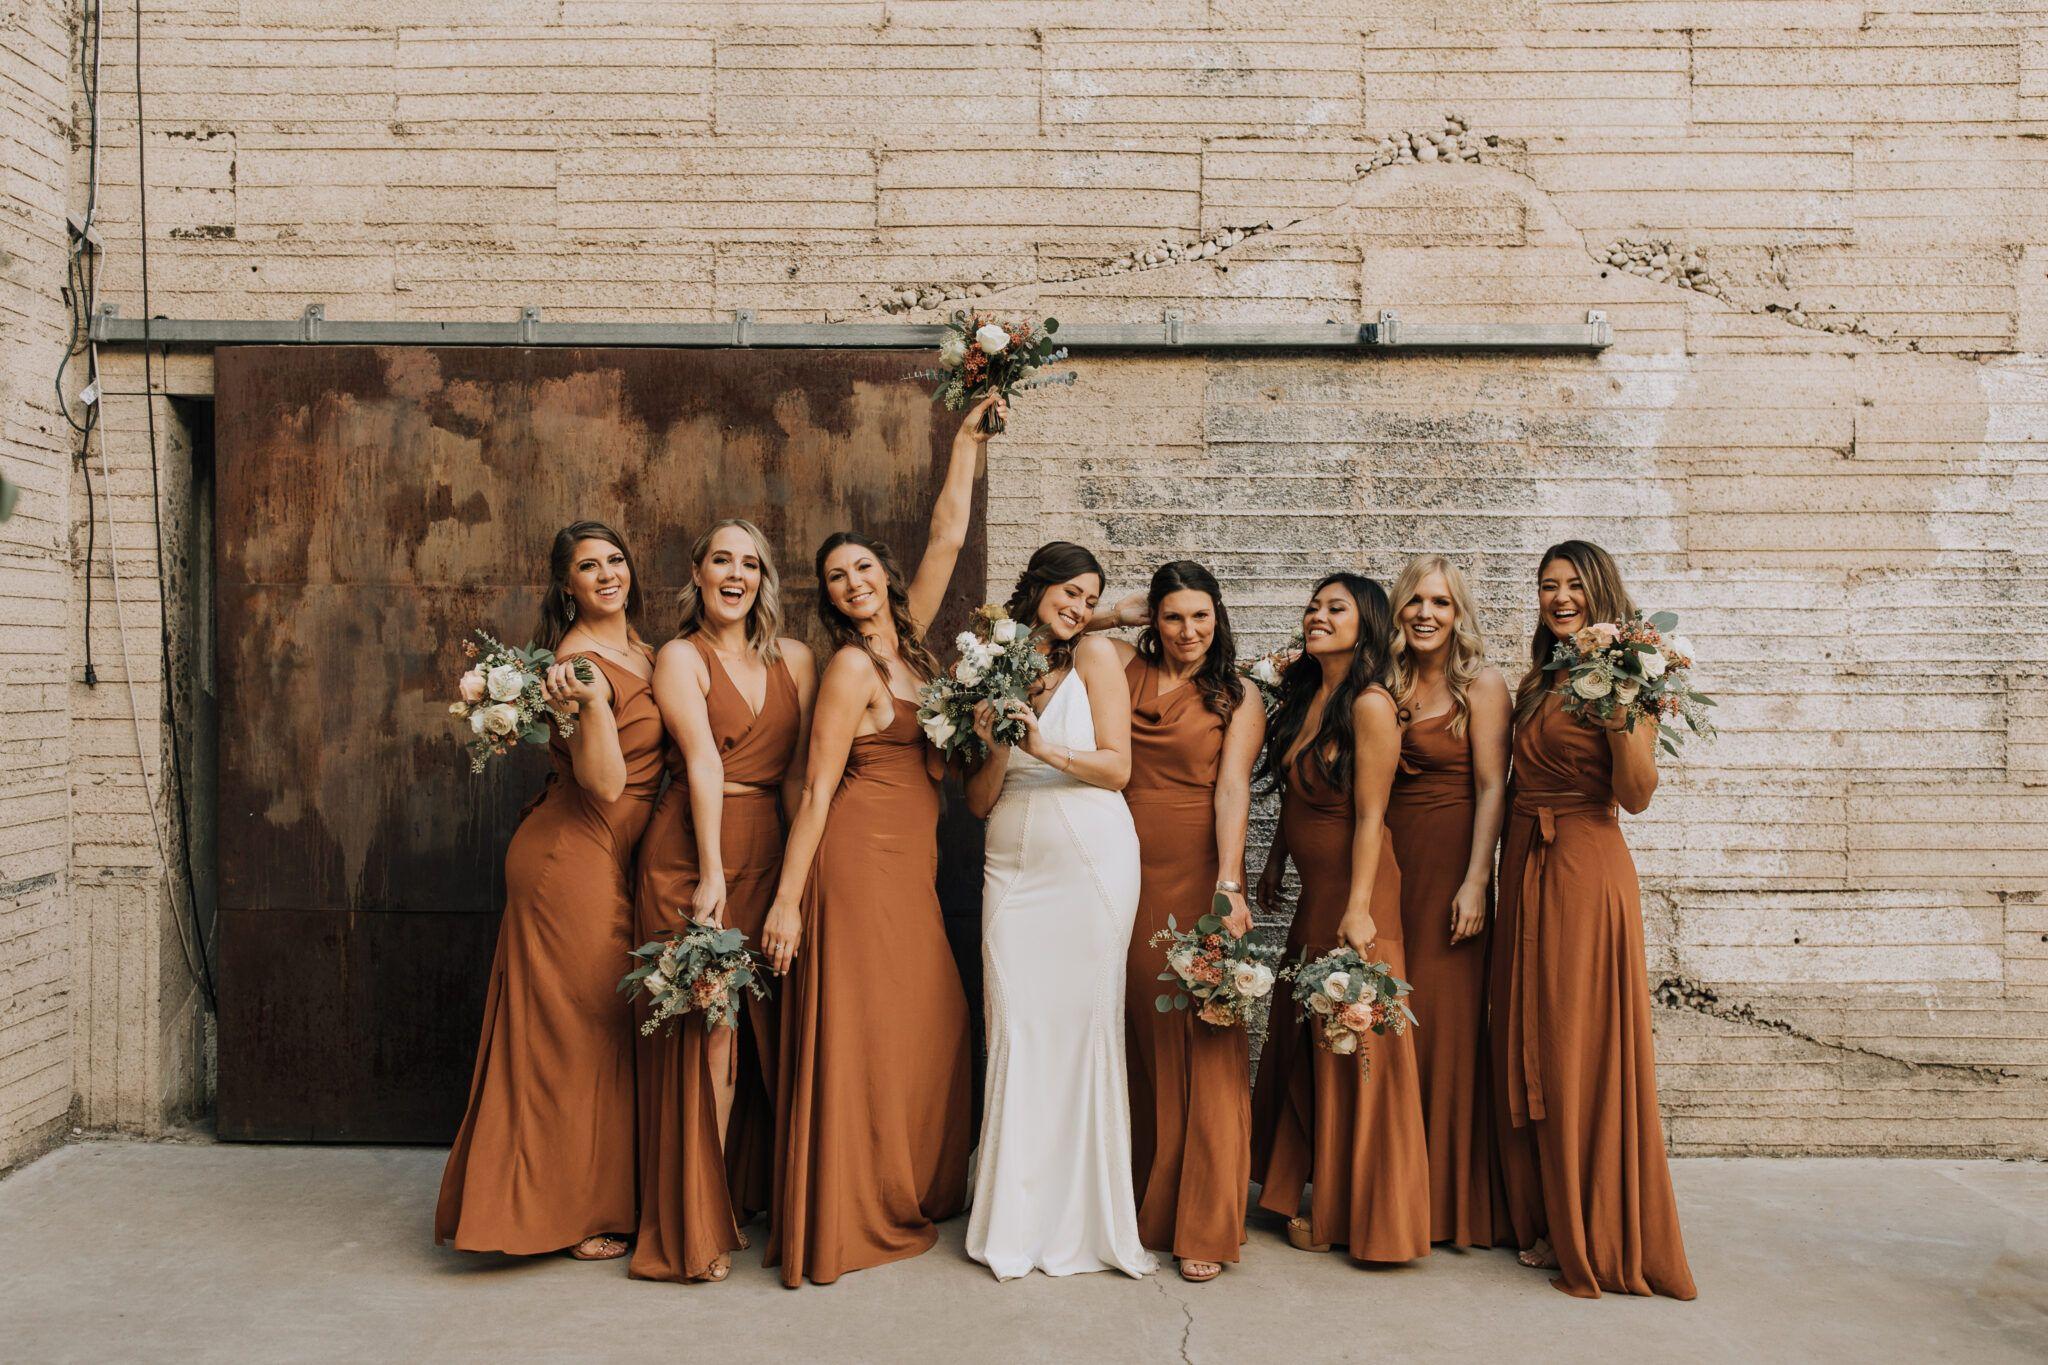 Phoenix Fall Wedding At The Icehouse Arraydesignaz Com In 2020 Fall Bridesmaid Dresses Orange Bridesmaid Dresses Wedding Bridesmaid Dresses